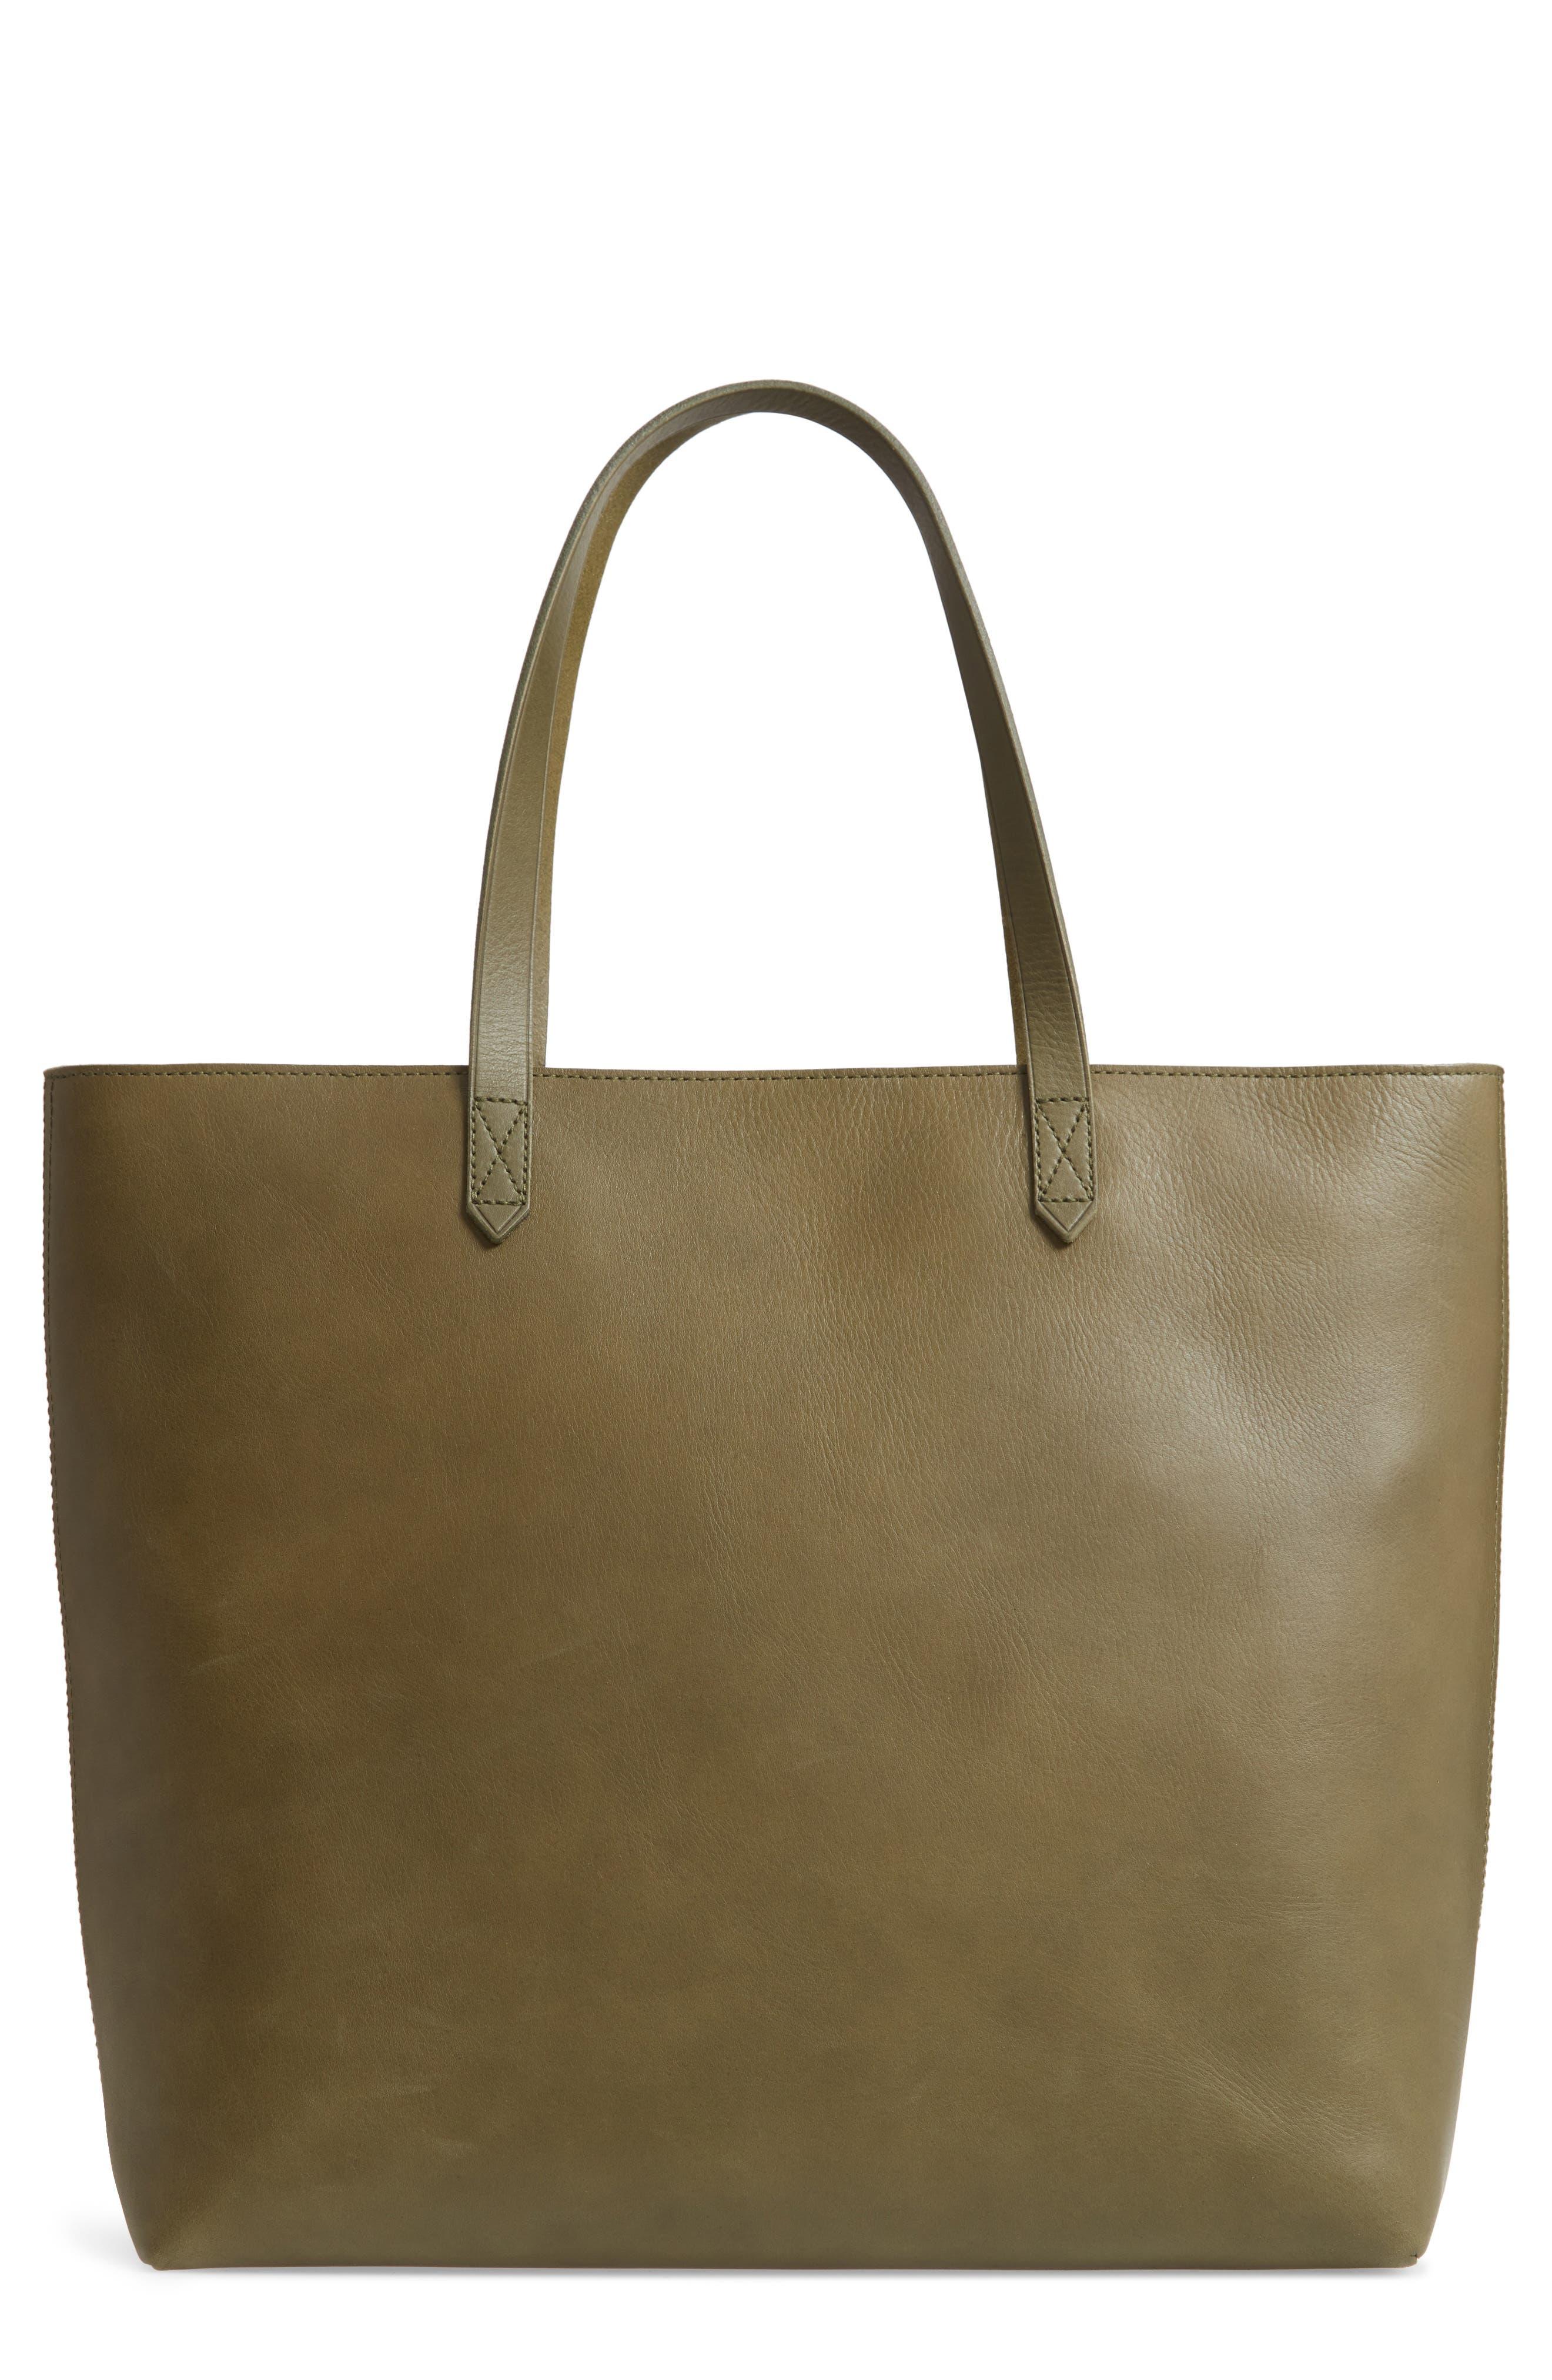 a7ce60edef Madewell Handbags   Accessories  Sale